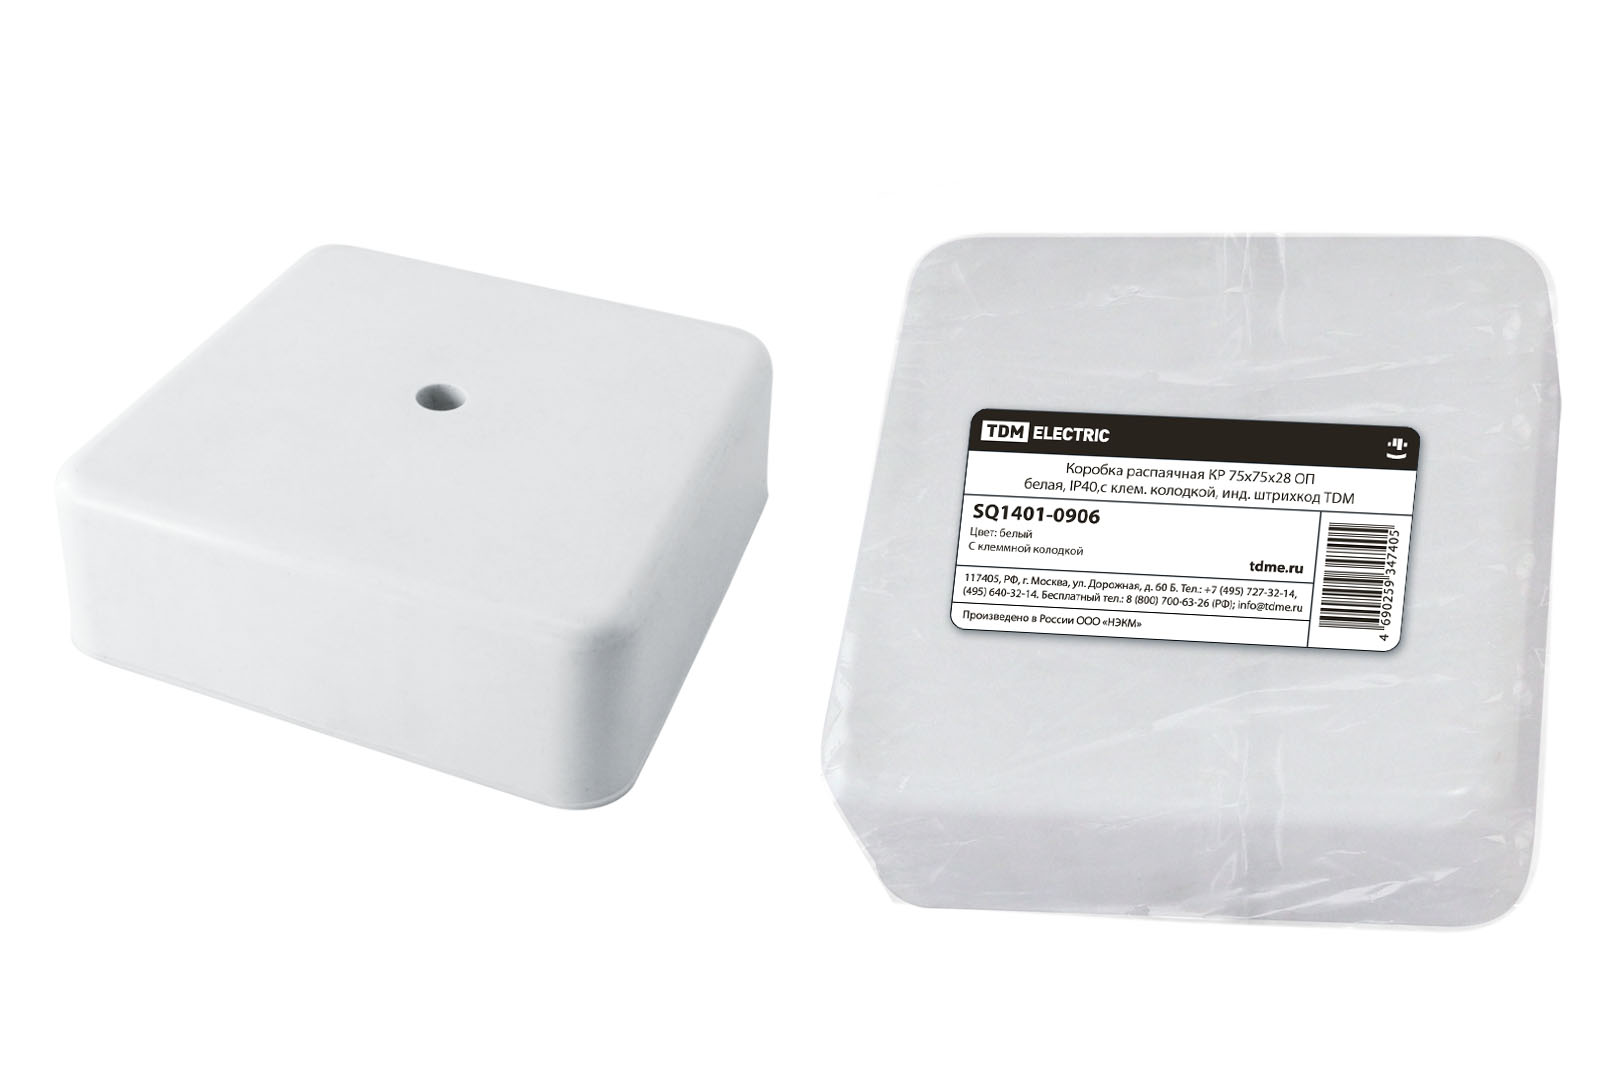 Фото Коробка распаячная КР 75х75х28 ОП белая, IP40, с клем. колодкой, инд. штрихкод TDM {SQ1401-0906}